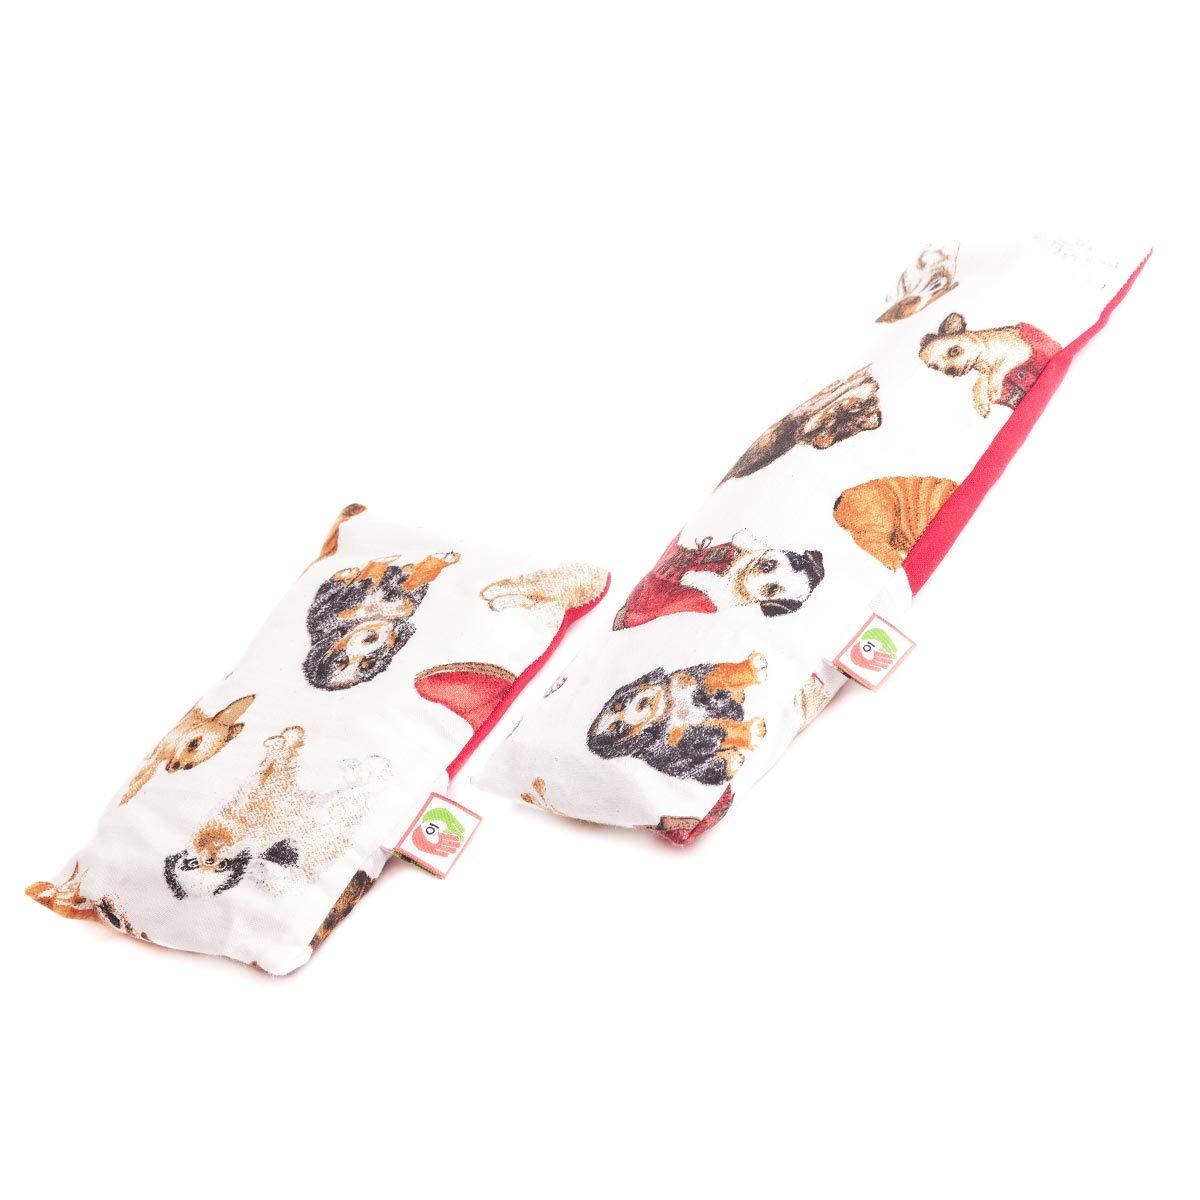 Pack dúo: cojín anticólicos de bebé (15x10cm) + saco térmico calienta cunas (25x10cm) Con funda para lavar, tela de algodón 100% y suave olor a ...